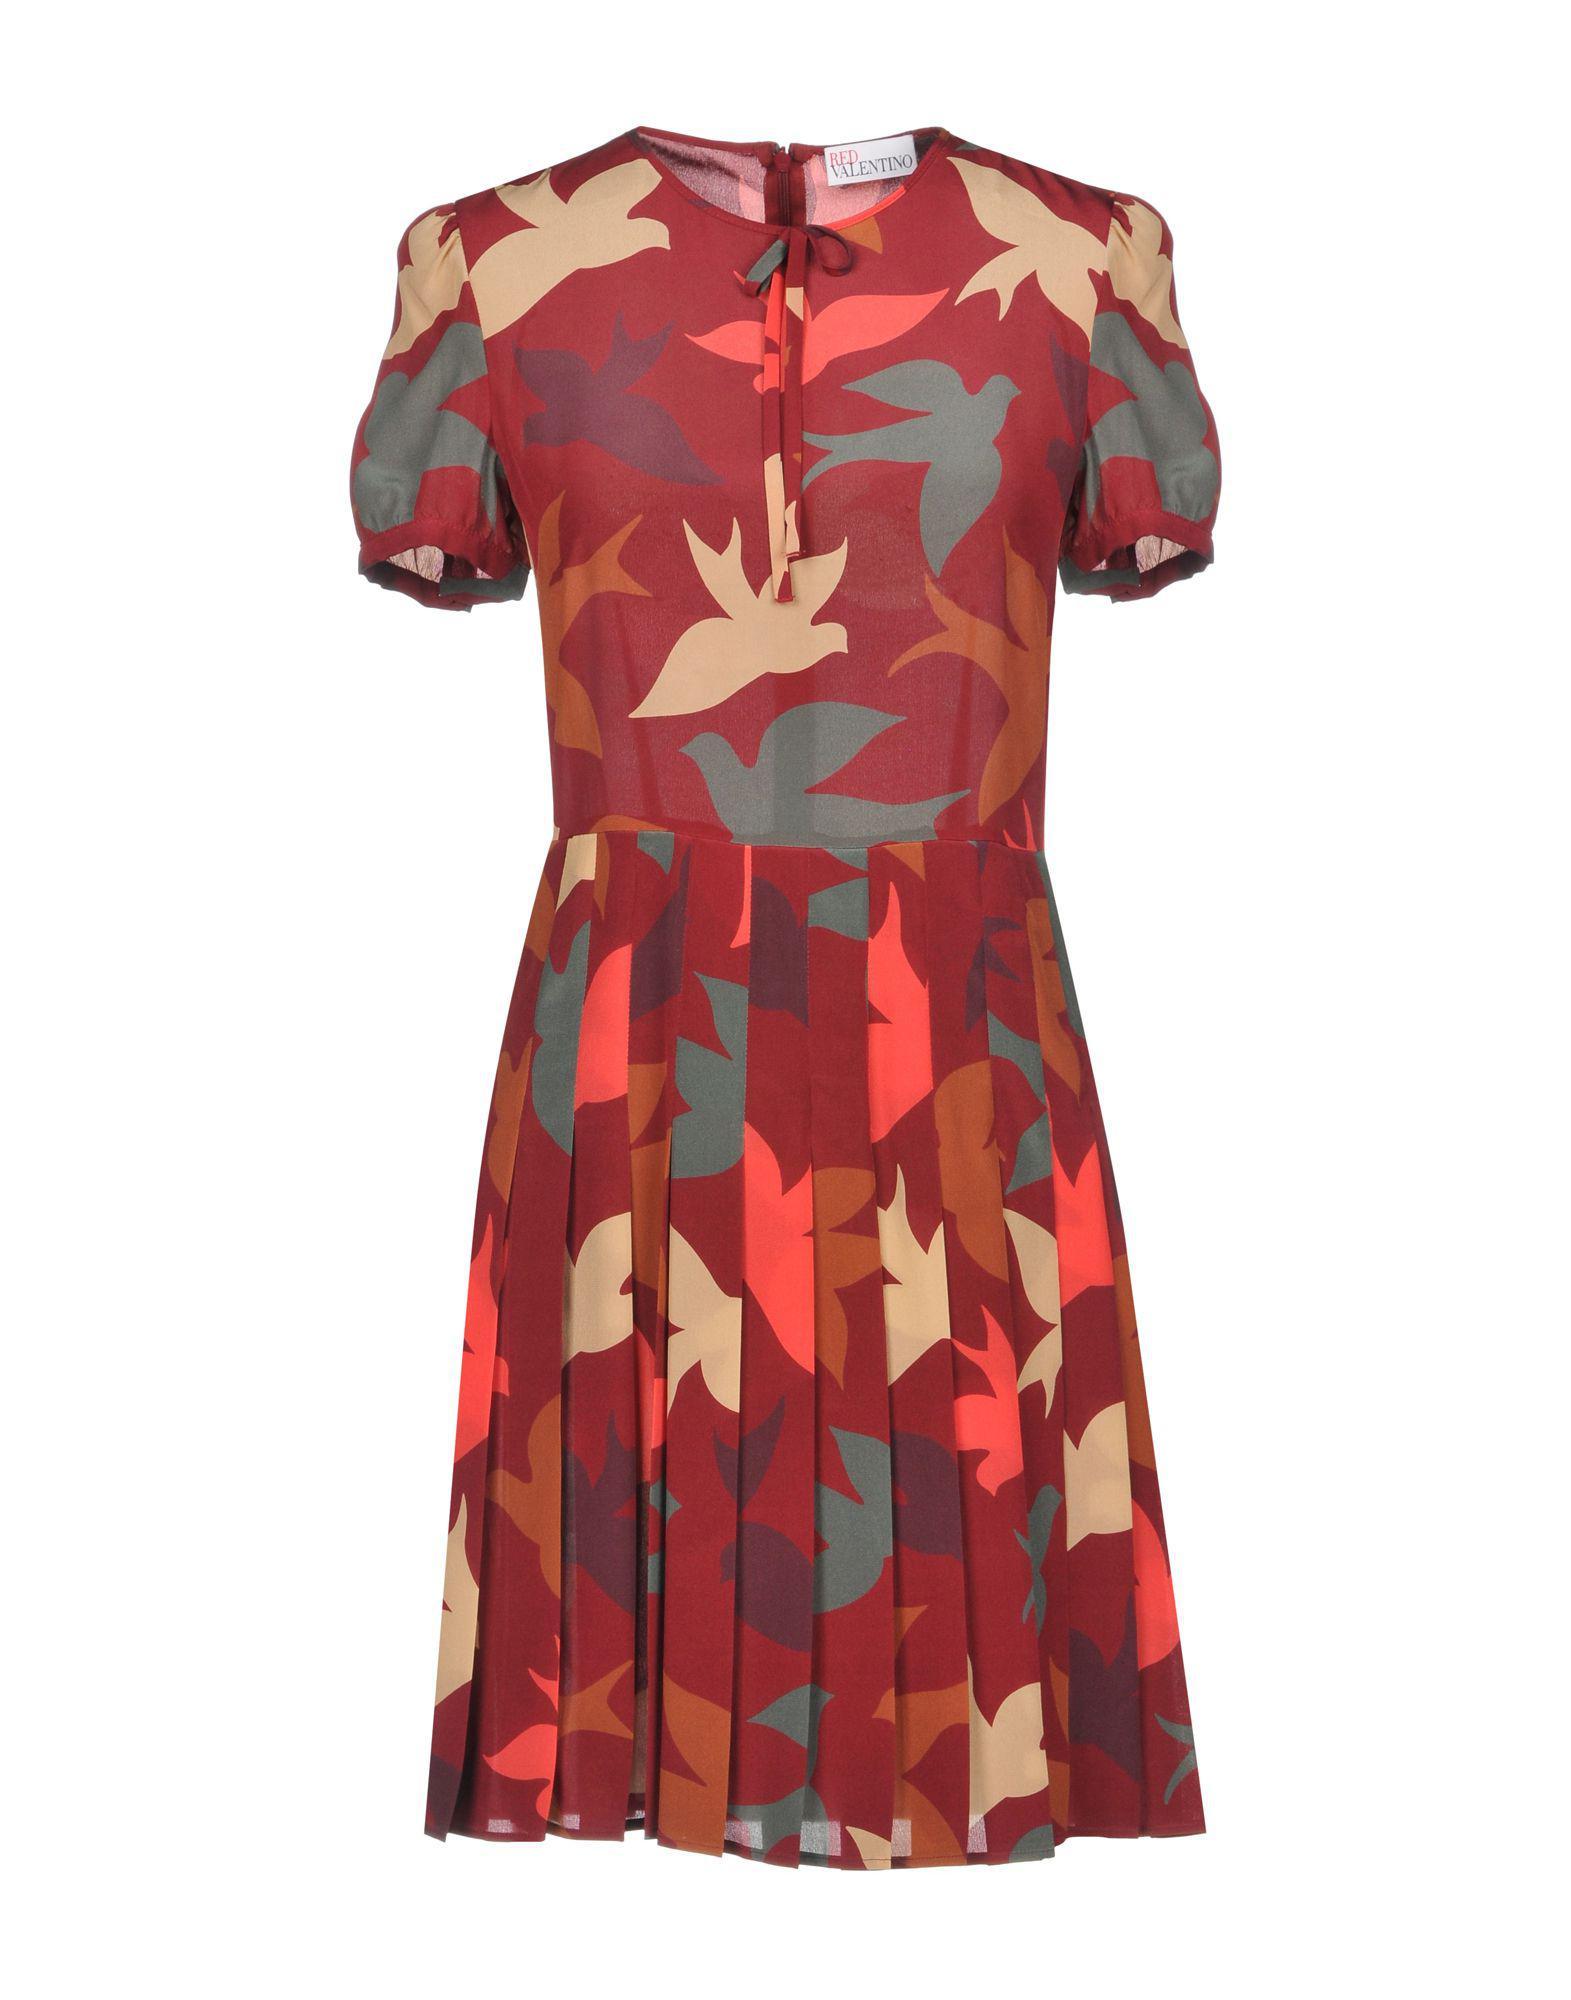 35d1df5bcca2 https   www.lyst.com clothing red-valentino-short-dresses-103  2018 ...